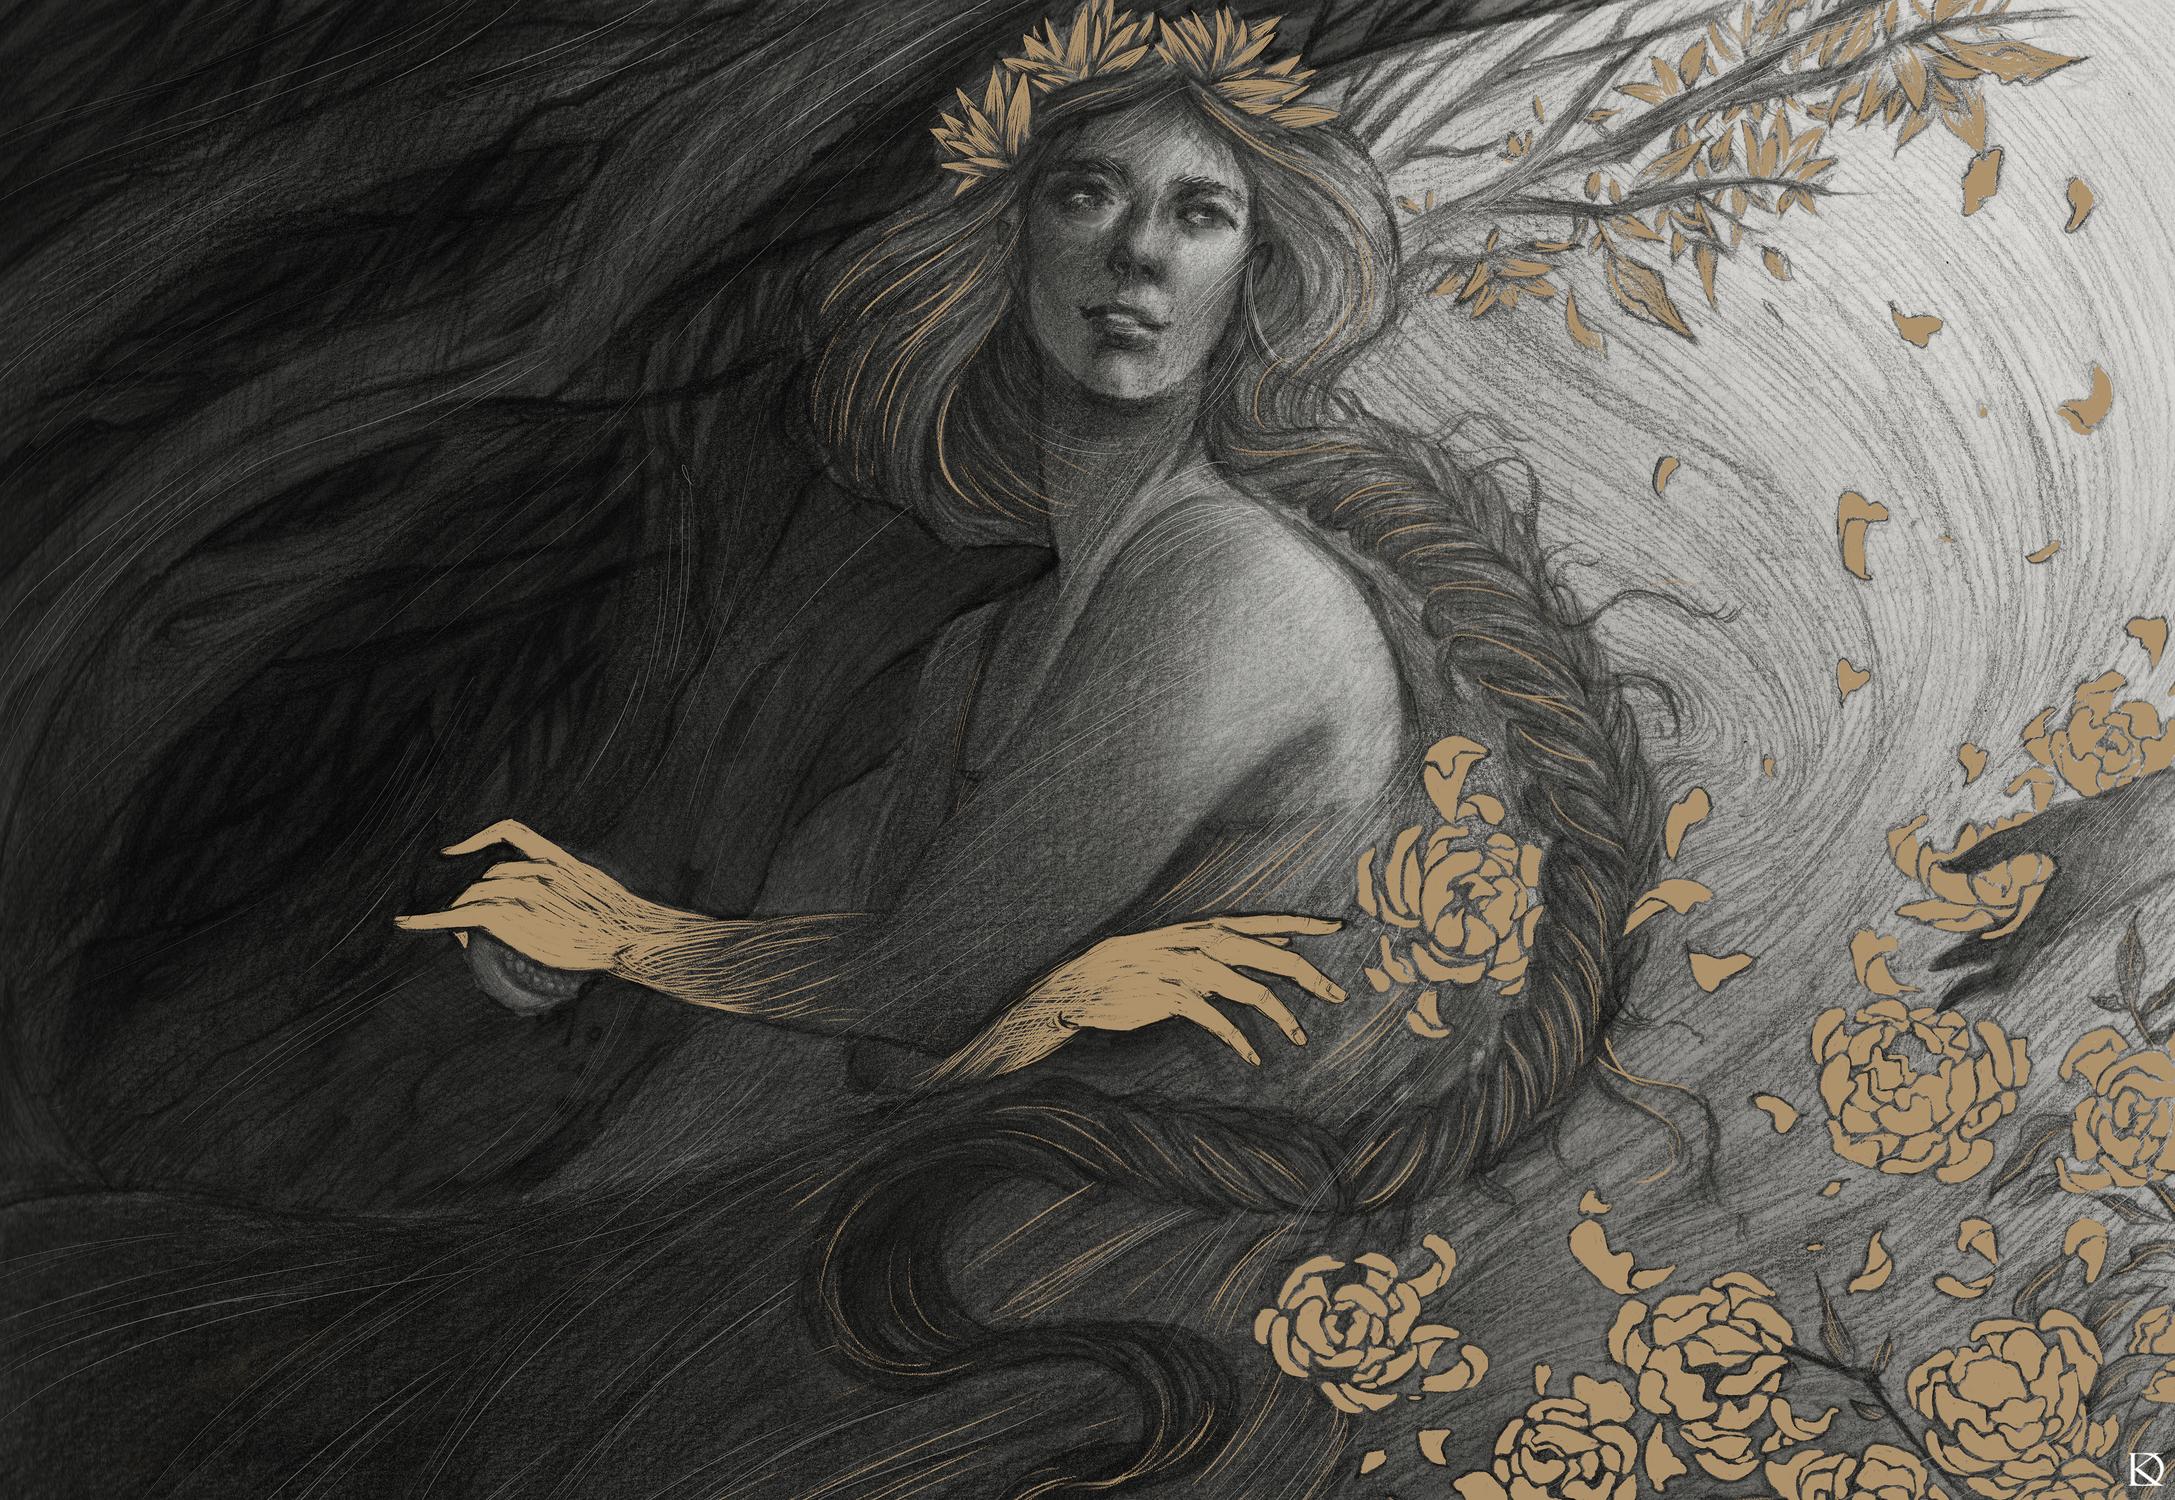 Persephone Artwork by Kring Demetrio